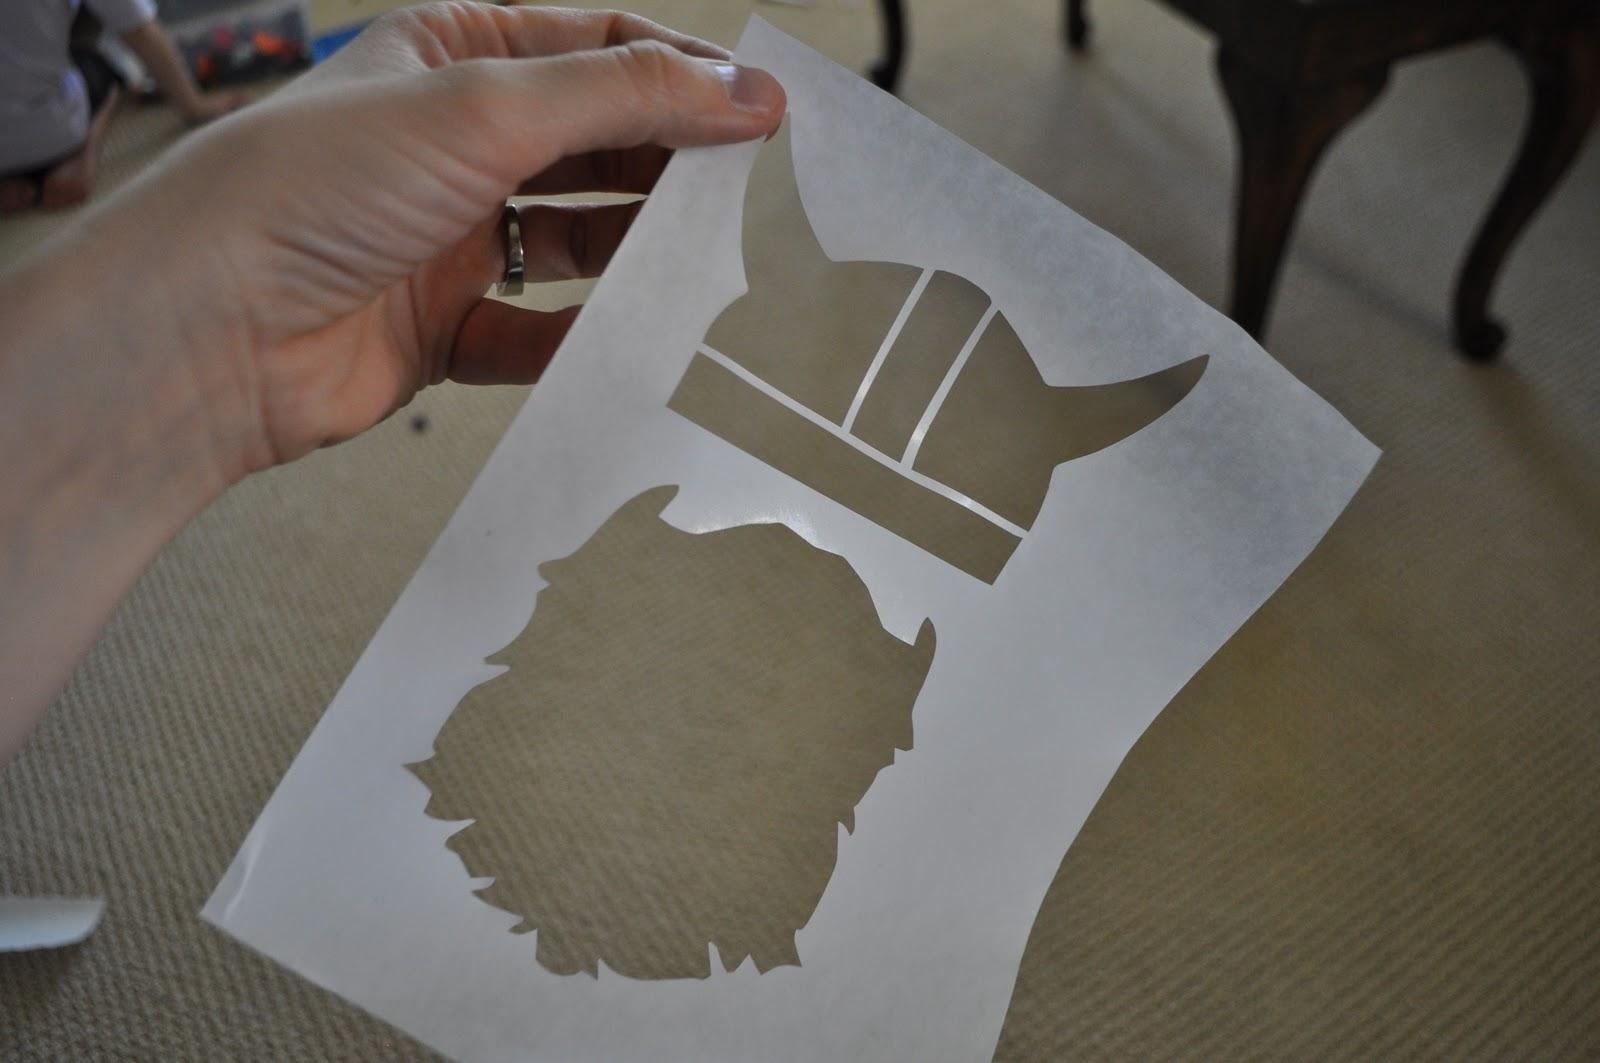 I Am Momma - Hear Me Roar: Cutting Freezer Paper with a